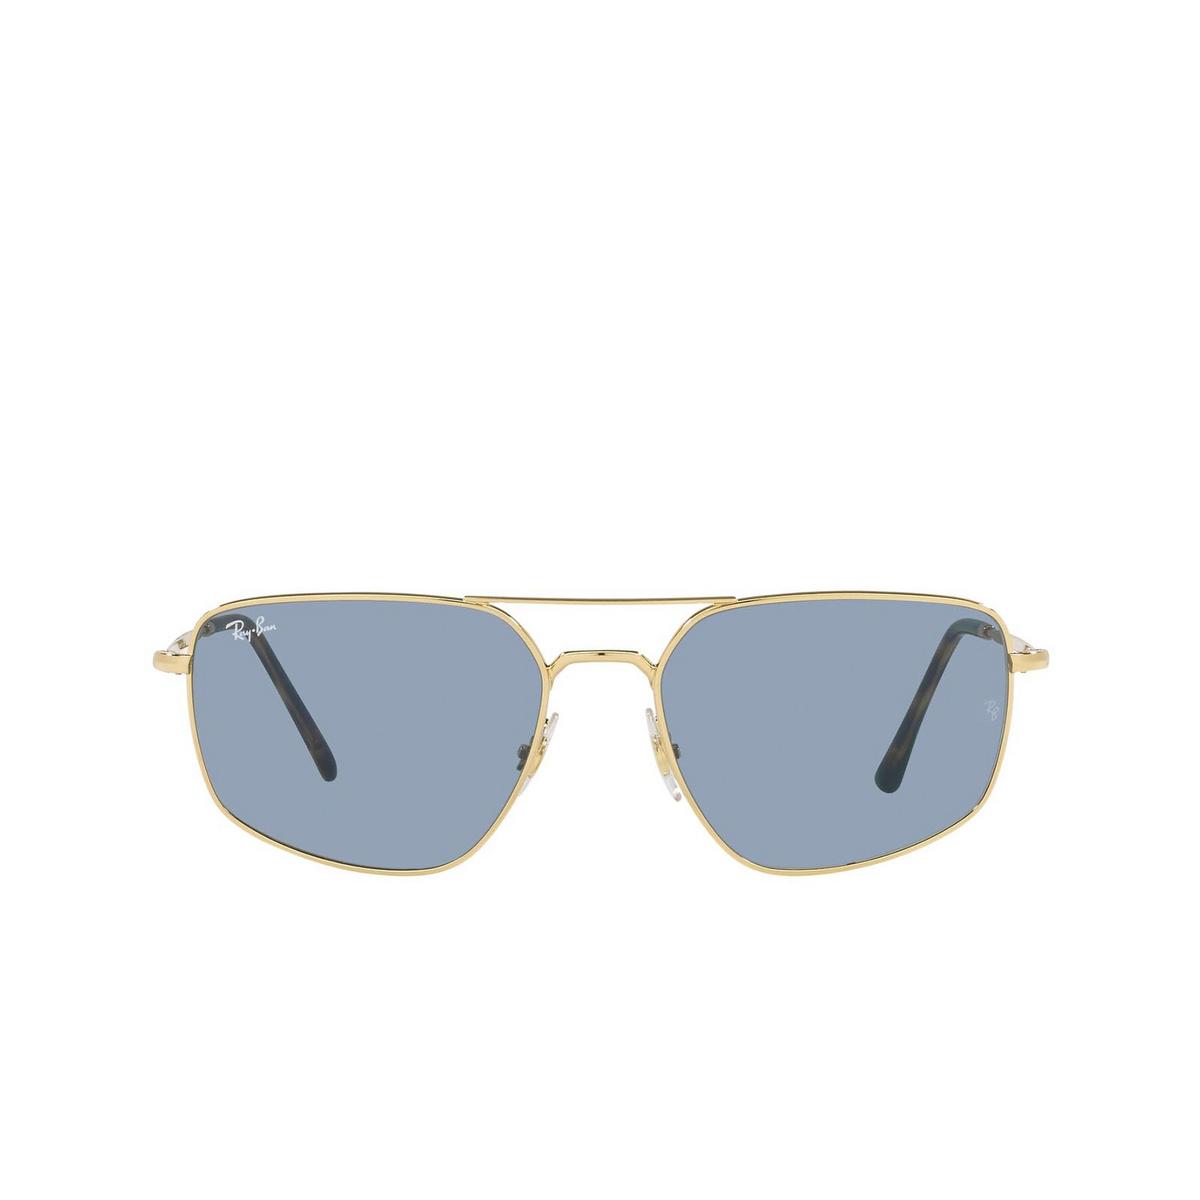 Ray-Ban® Irregular Sunglasses: RB3666 color Arista 001/62.